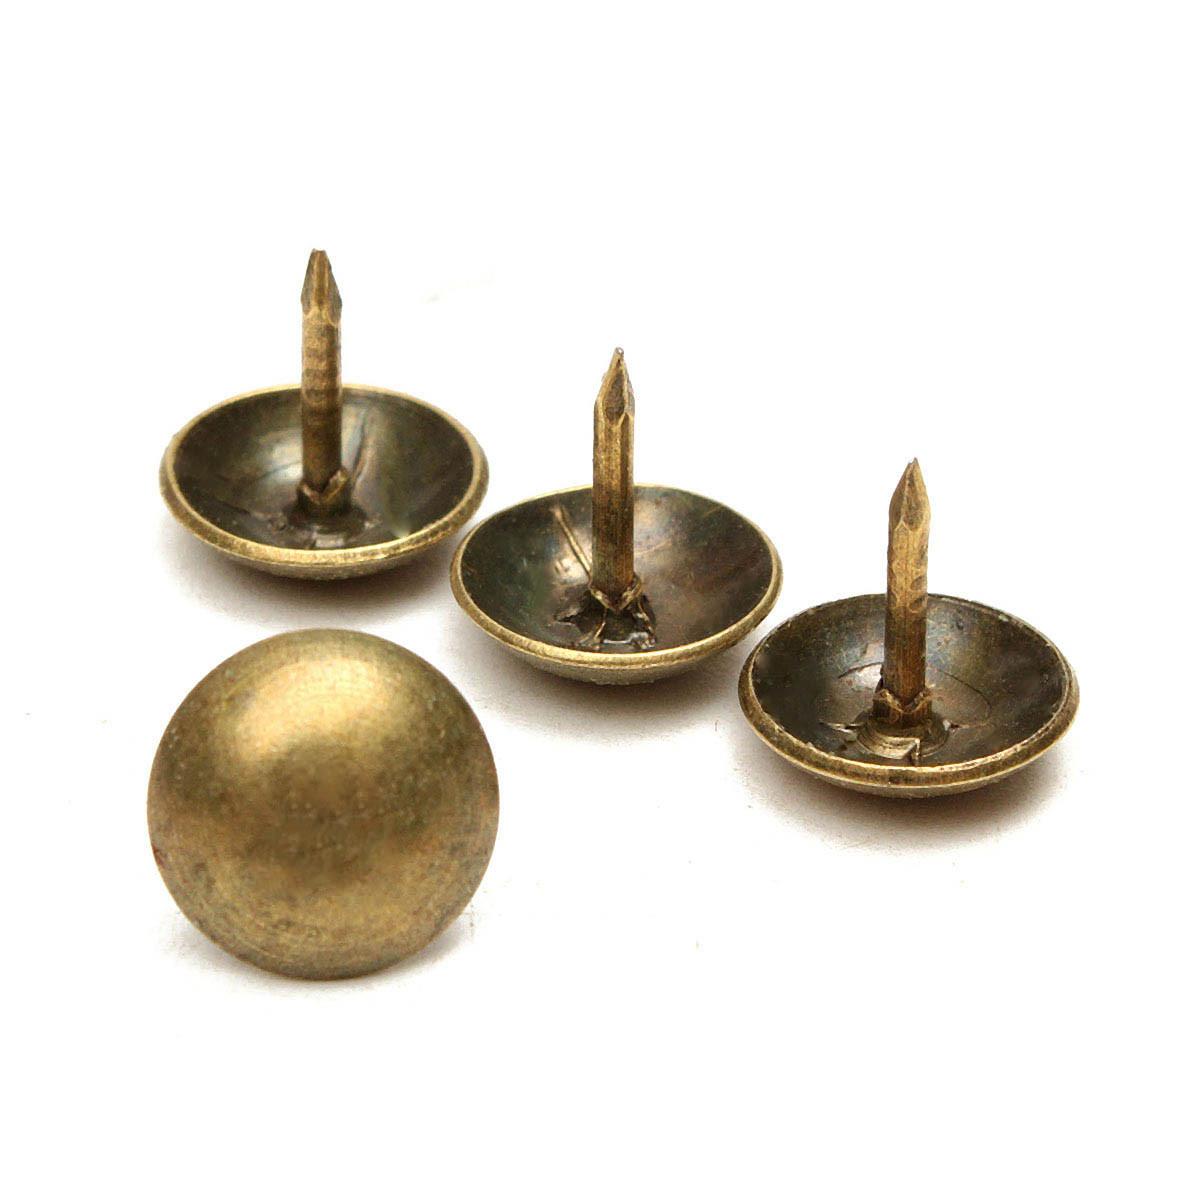 50 100pcs Antique Upholstery Tacks Brass Nails Furniture